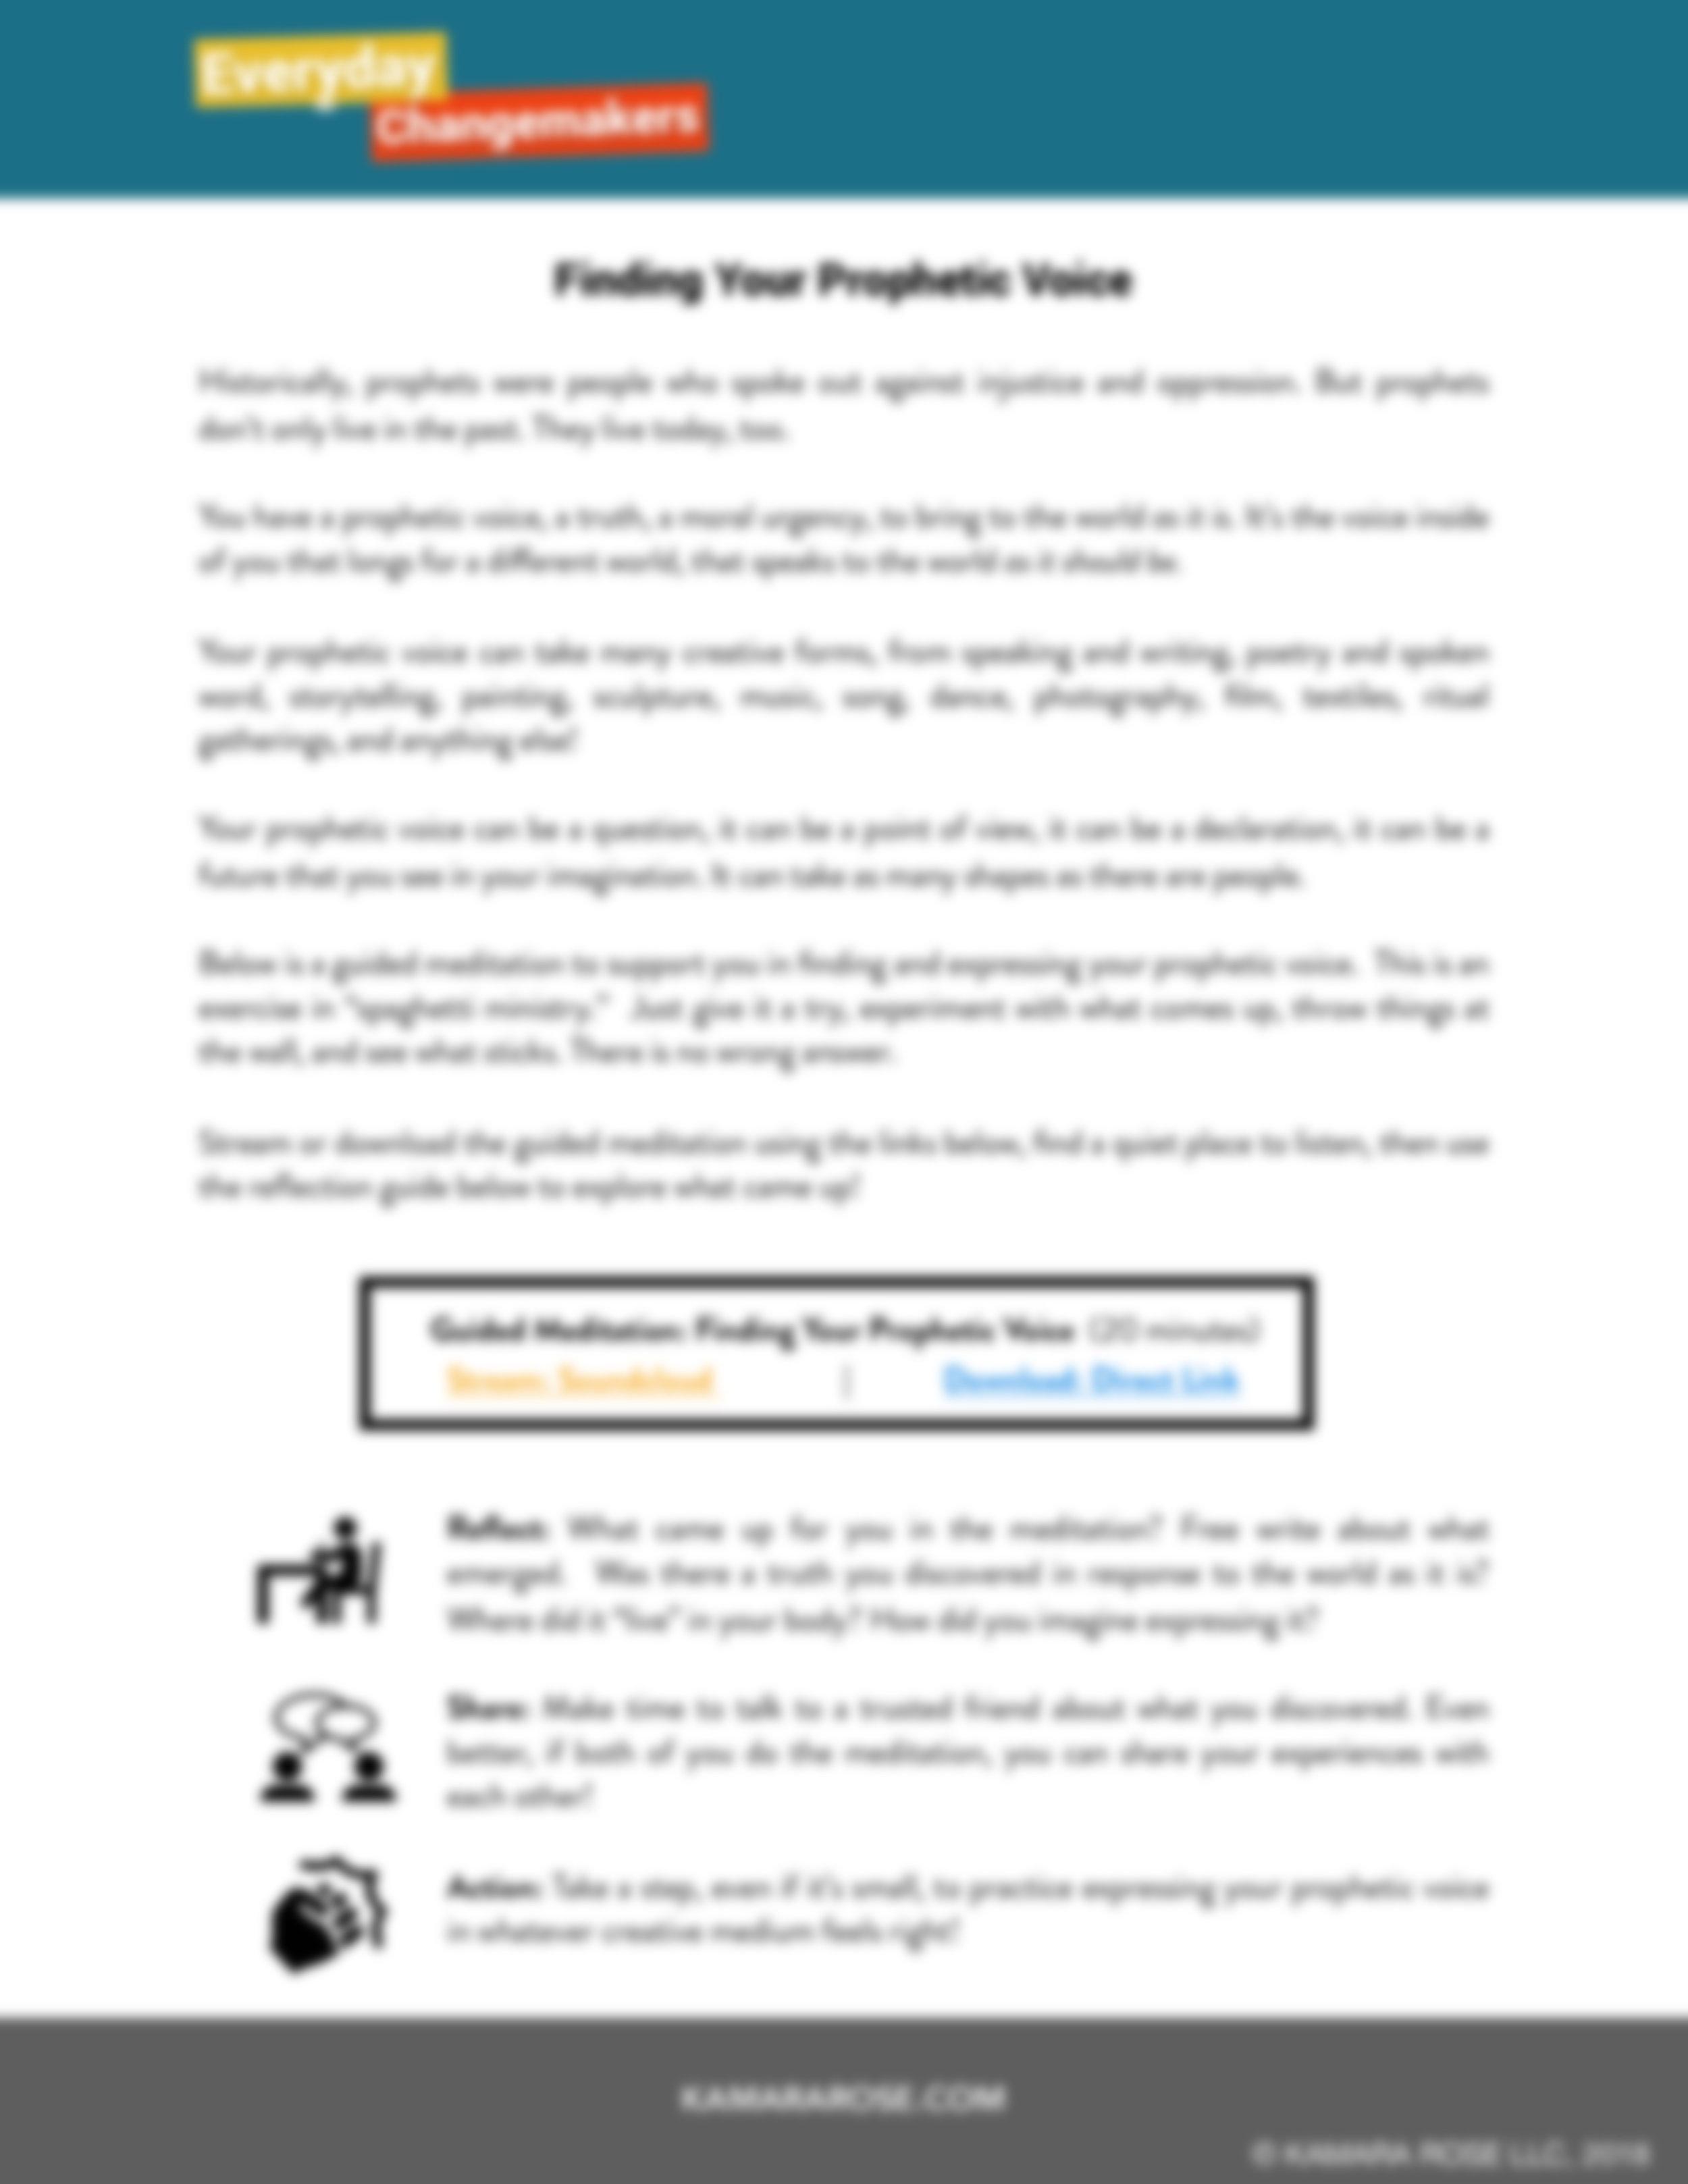 Finding-Your-Prophetic-Voice-blur-image.jpg